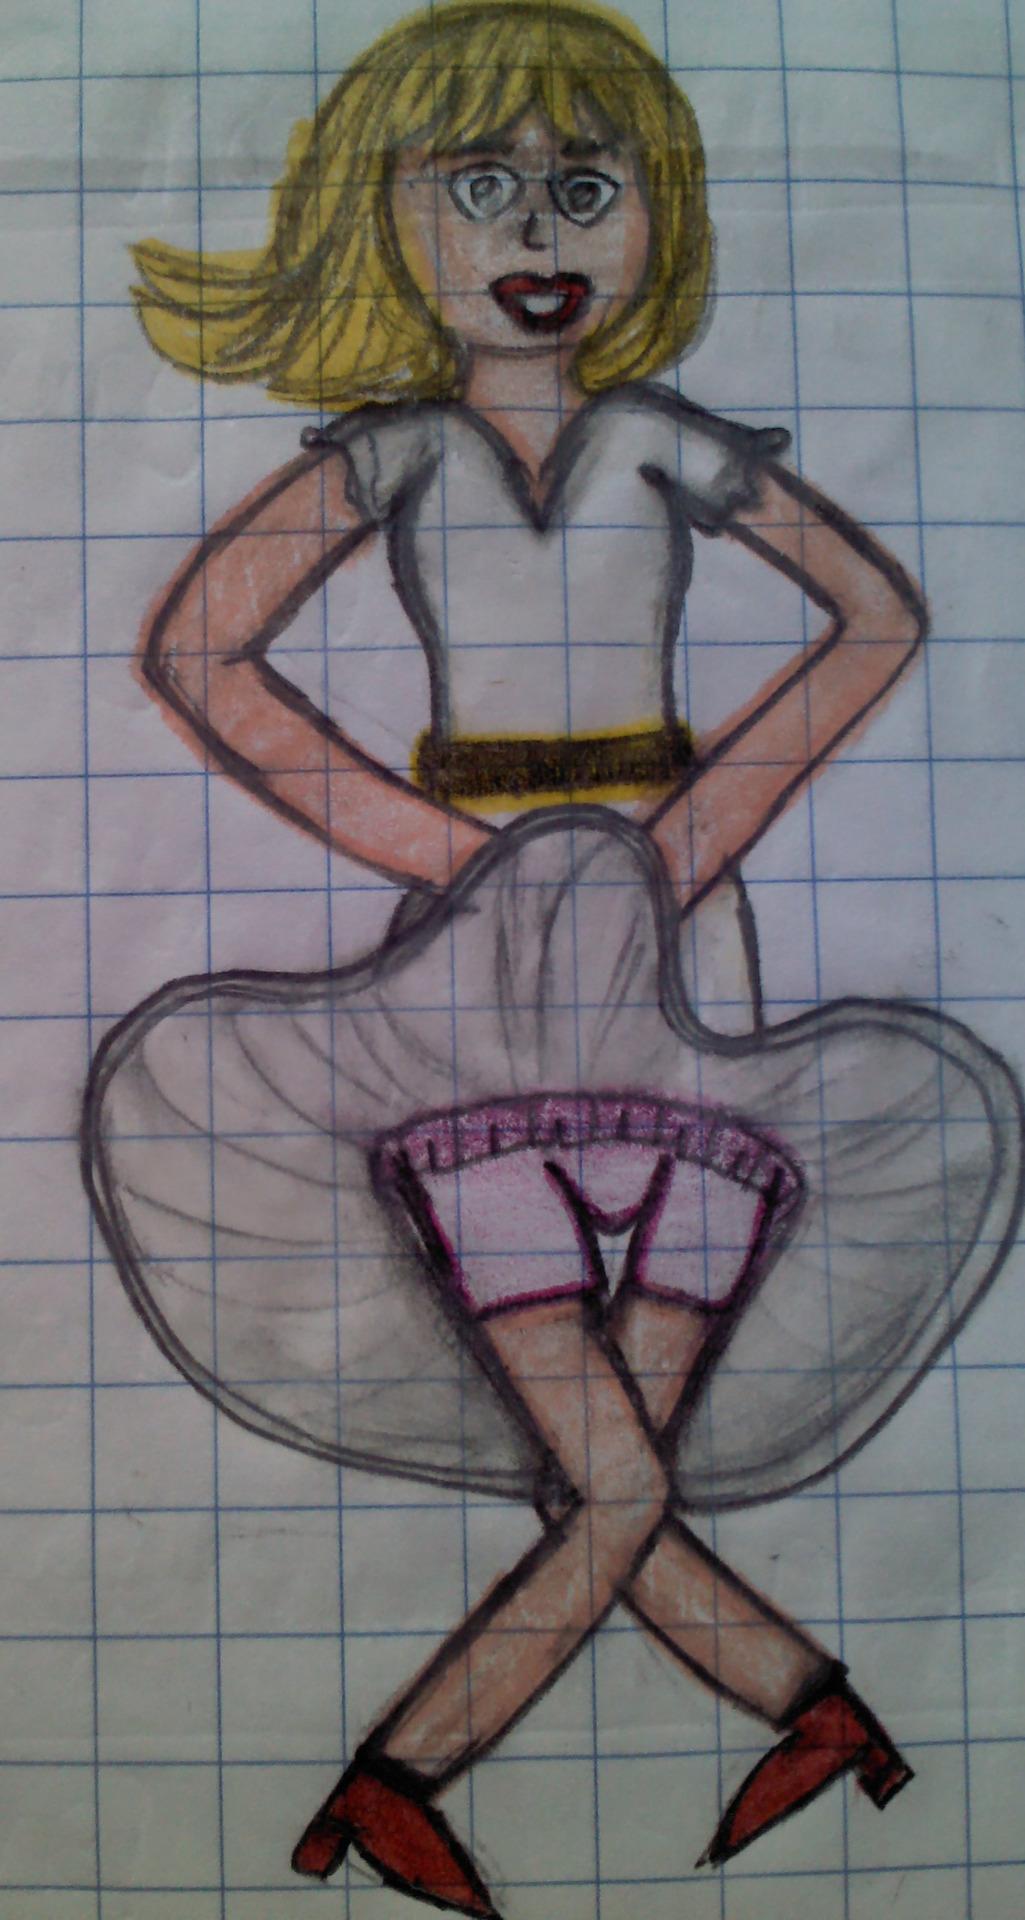 Dibujos a mano - Página 4 Tumblr_m39cwiSGum1ro6f9po3_1280